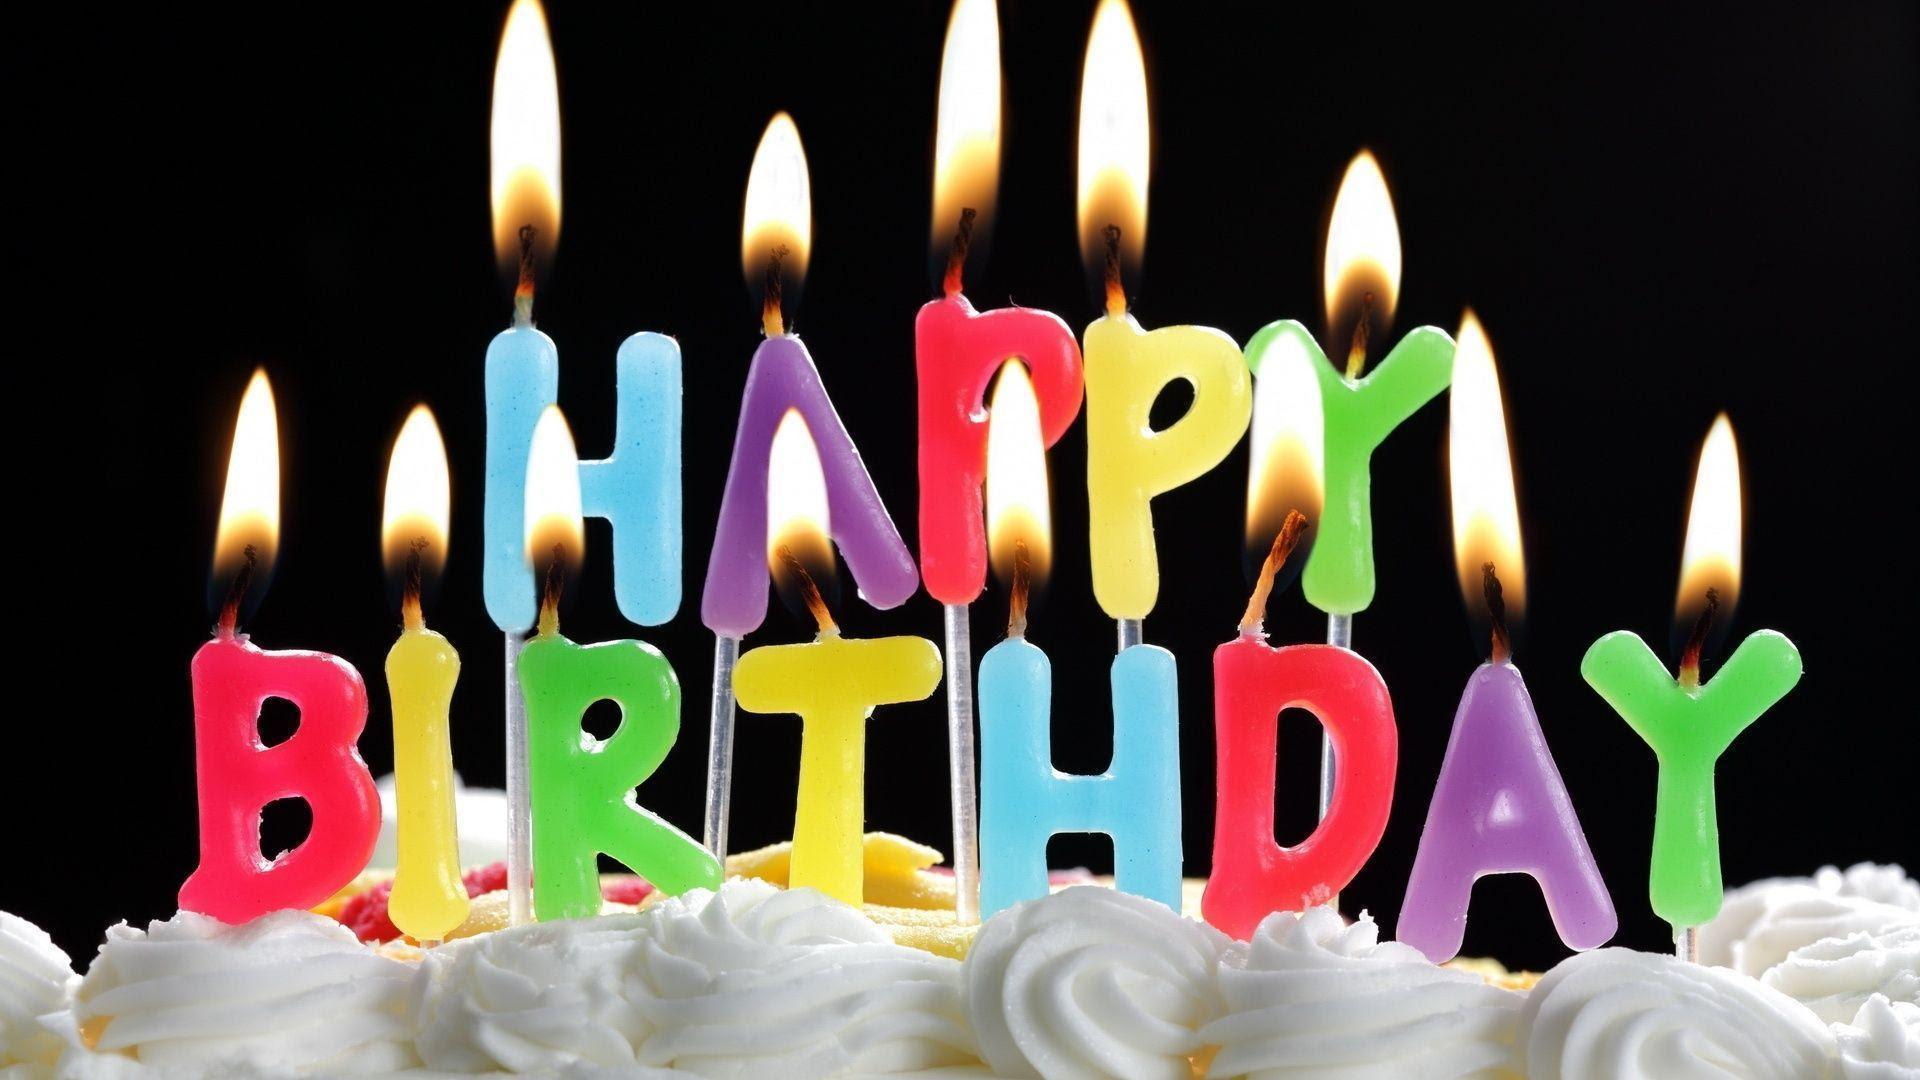 Happy Birthday Desktop Wallpaper Free Free Wallpapers Download